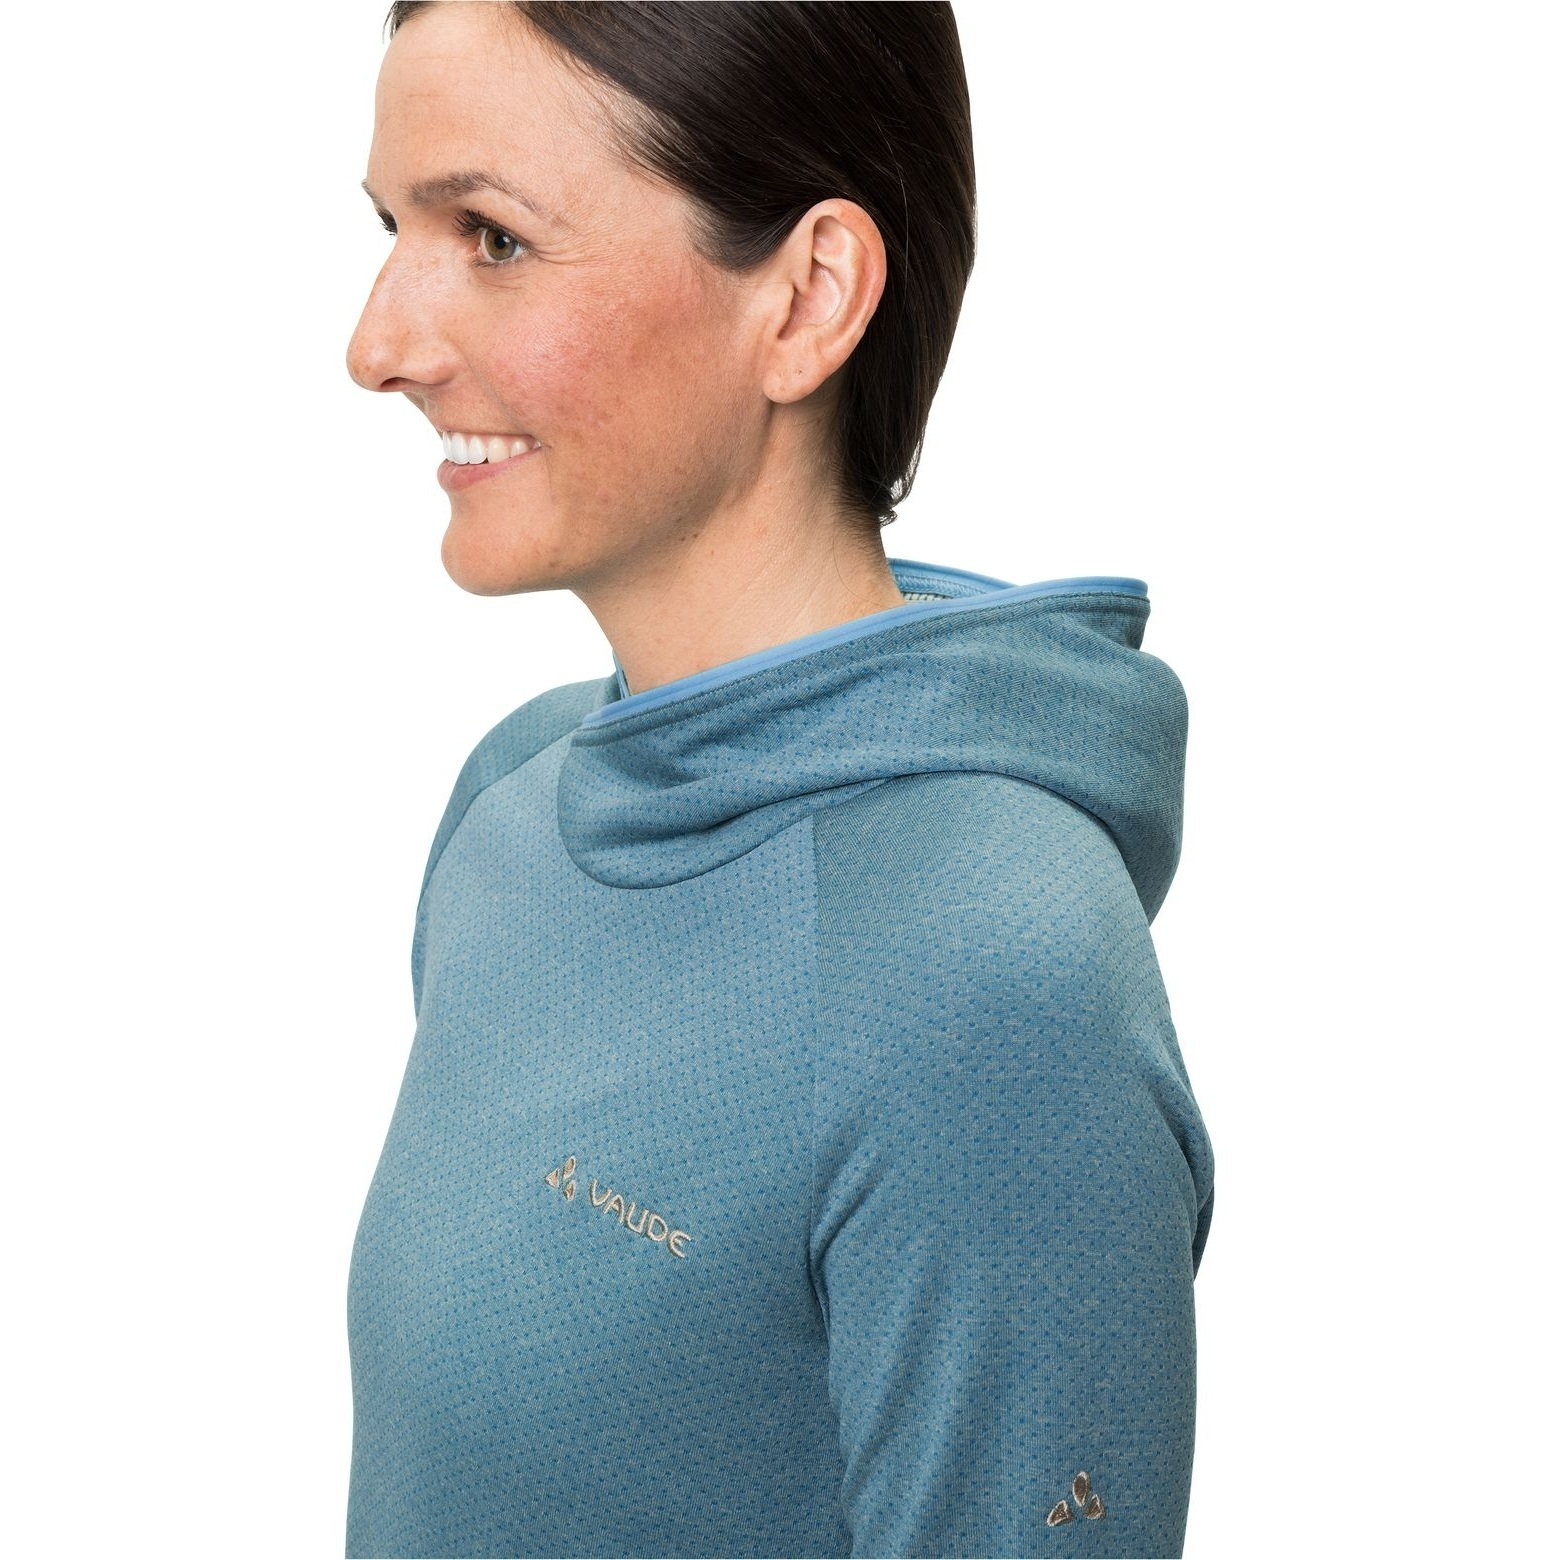 Bild von Vaude Miskanti LS T-Shirt II Damen - arctic blue